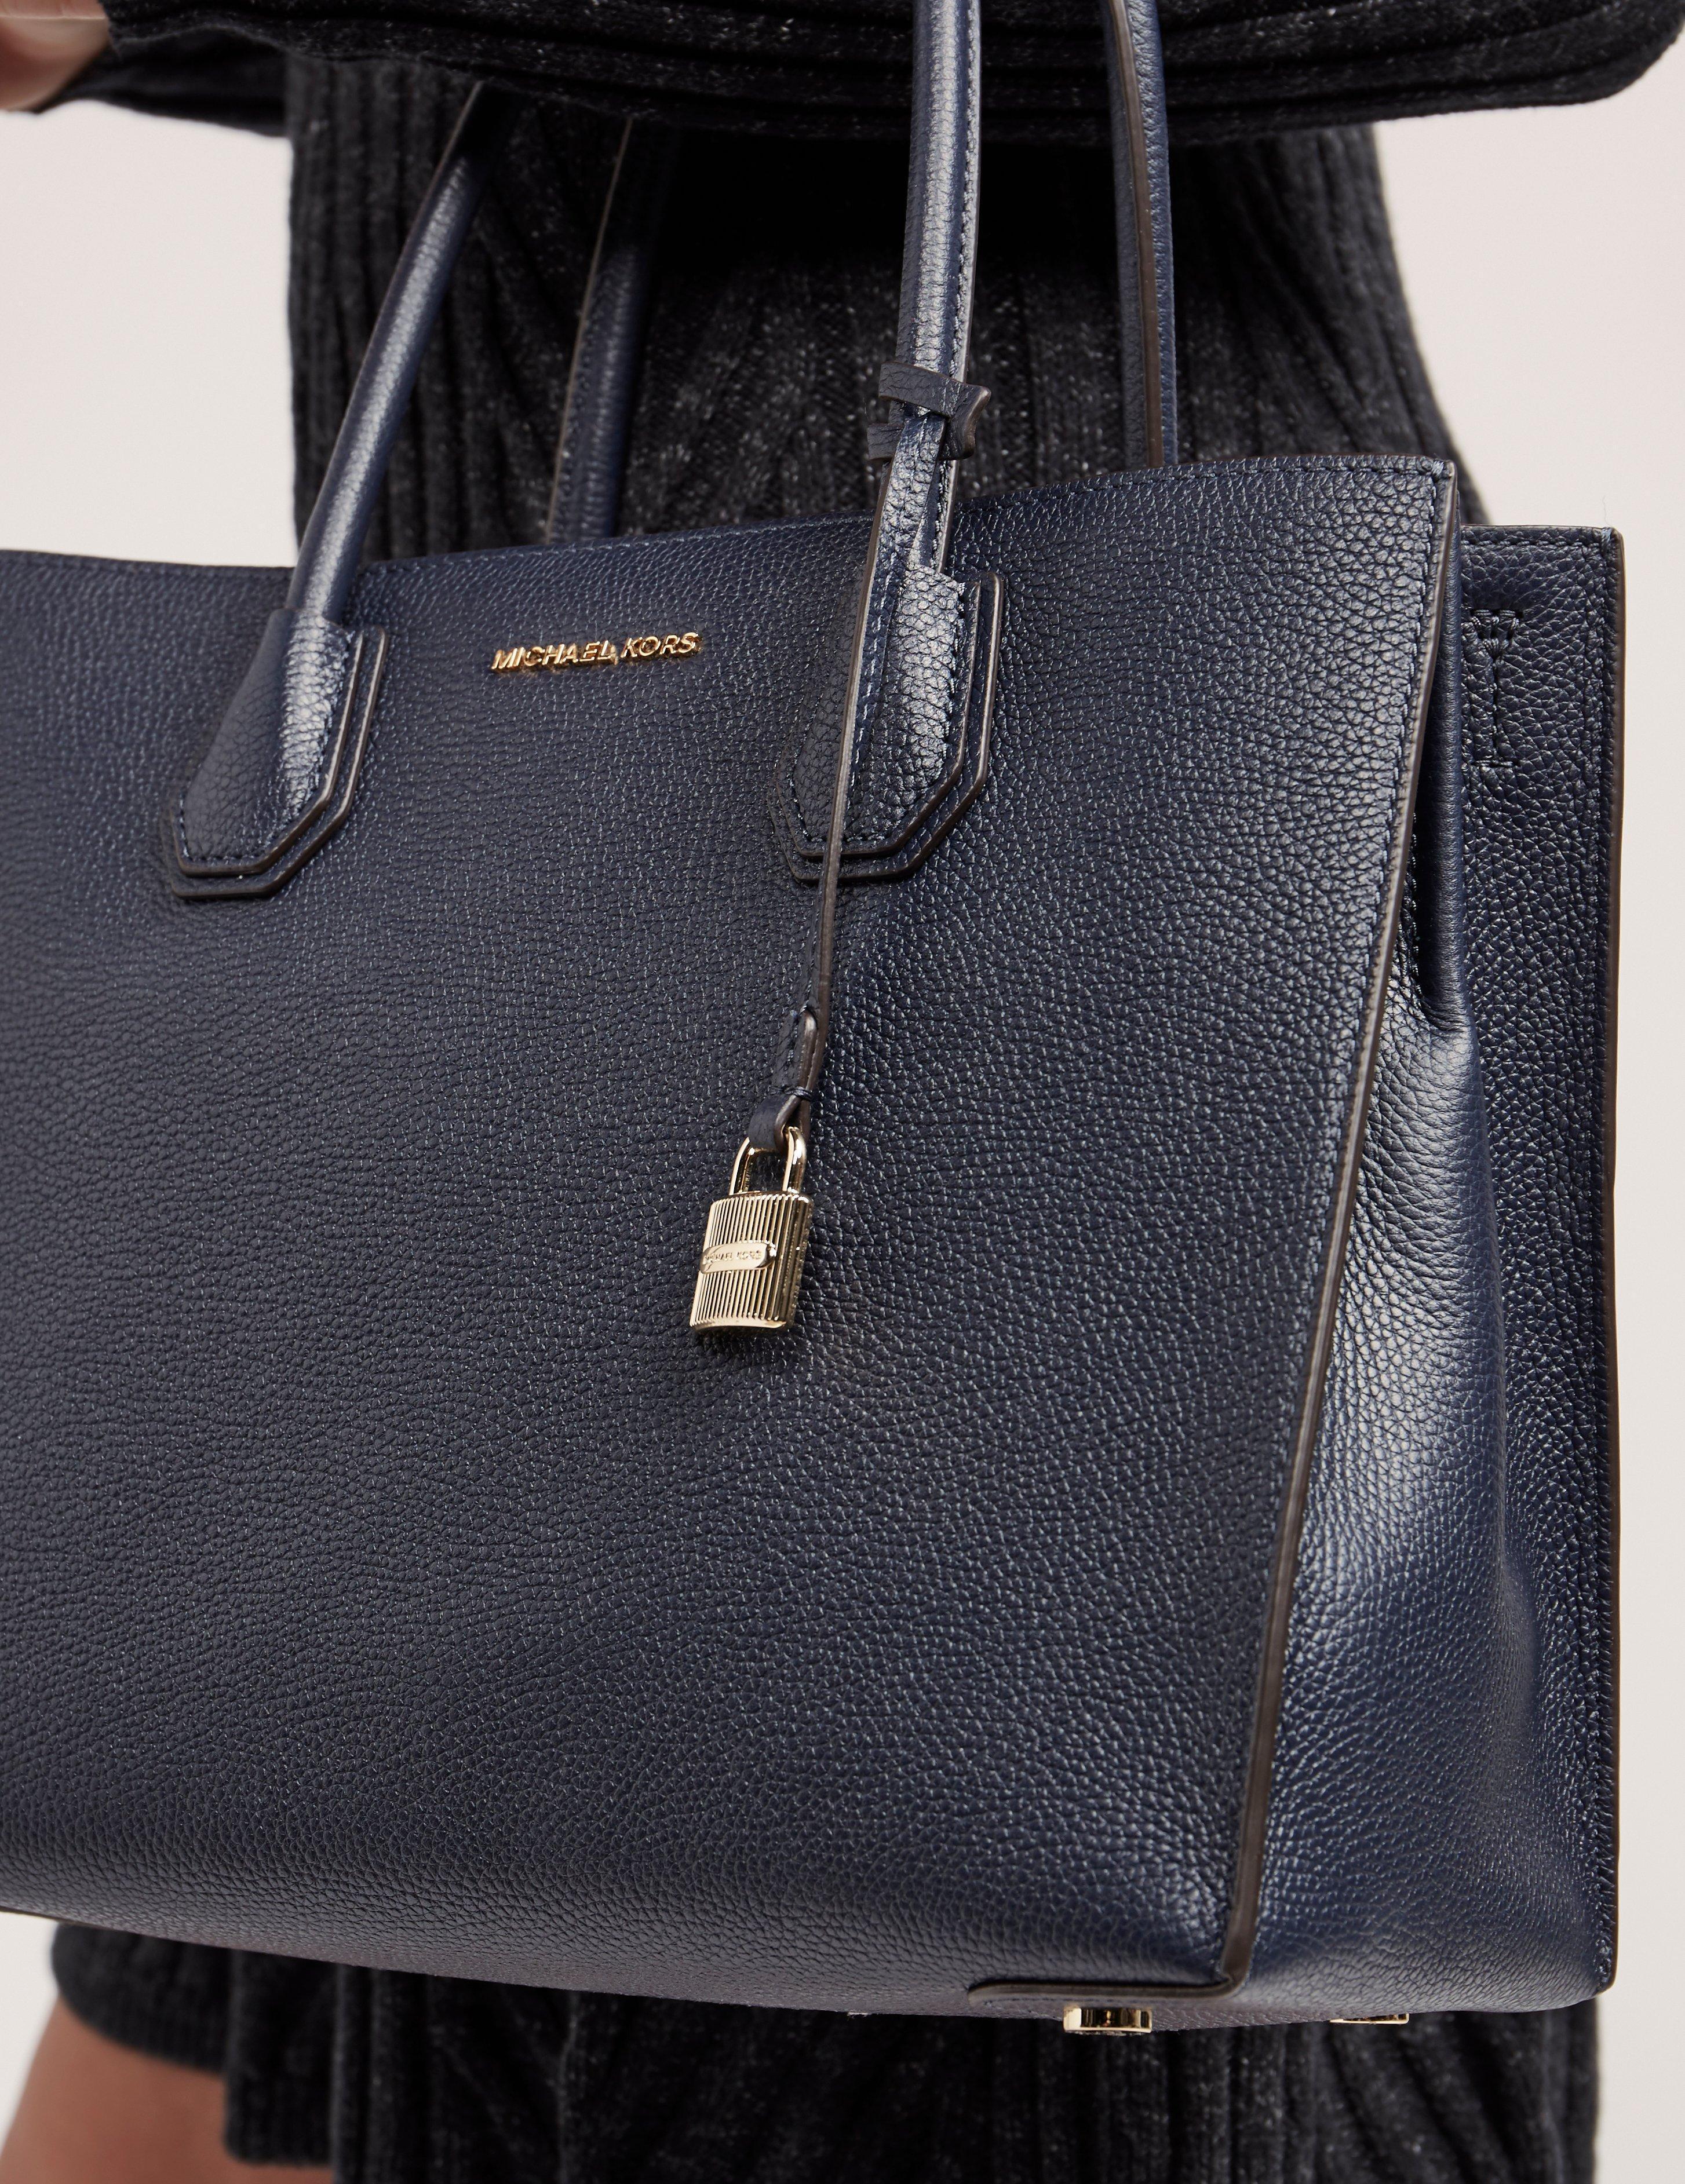 6eb122f6cb3b Michael Kors - Mercer Large Convertible Tote Bag Navy Blue - Lyst. View  fullscreen